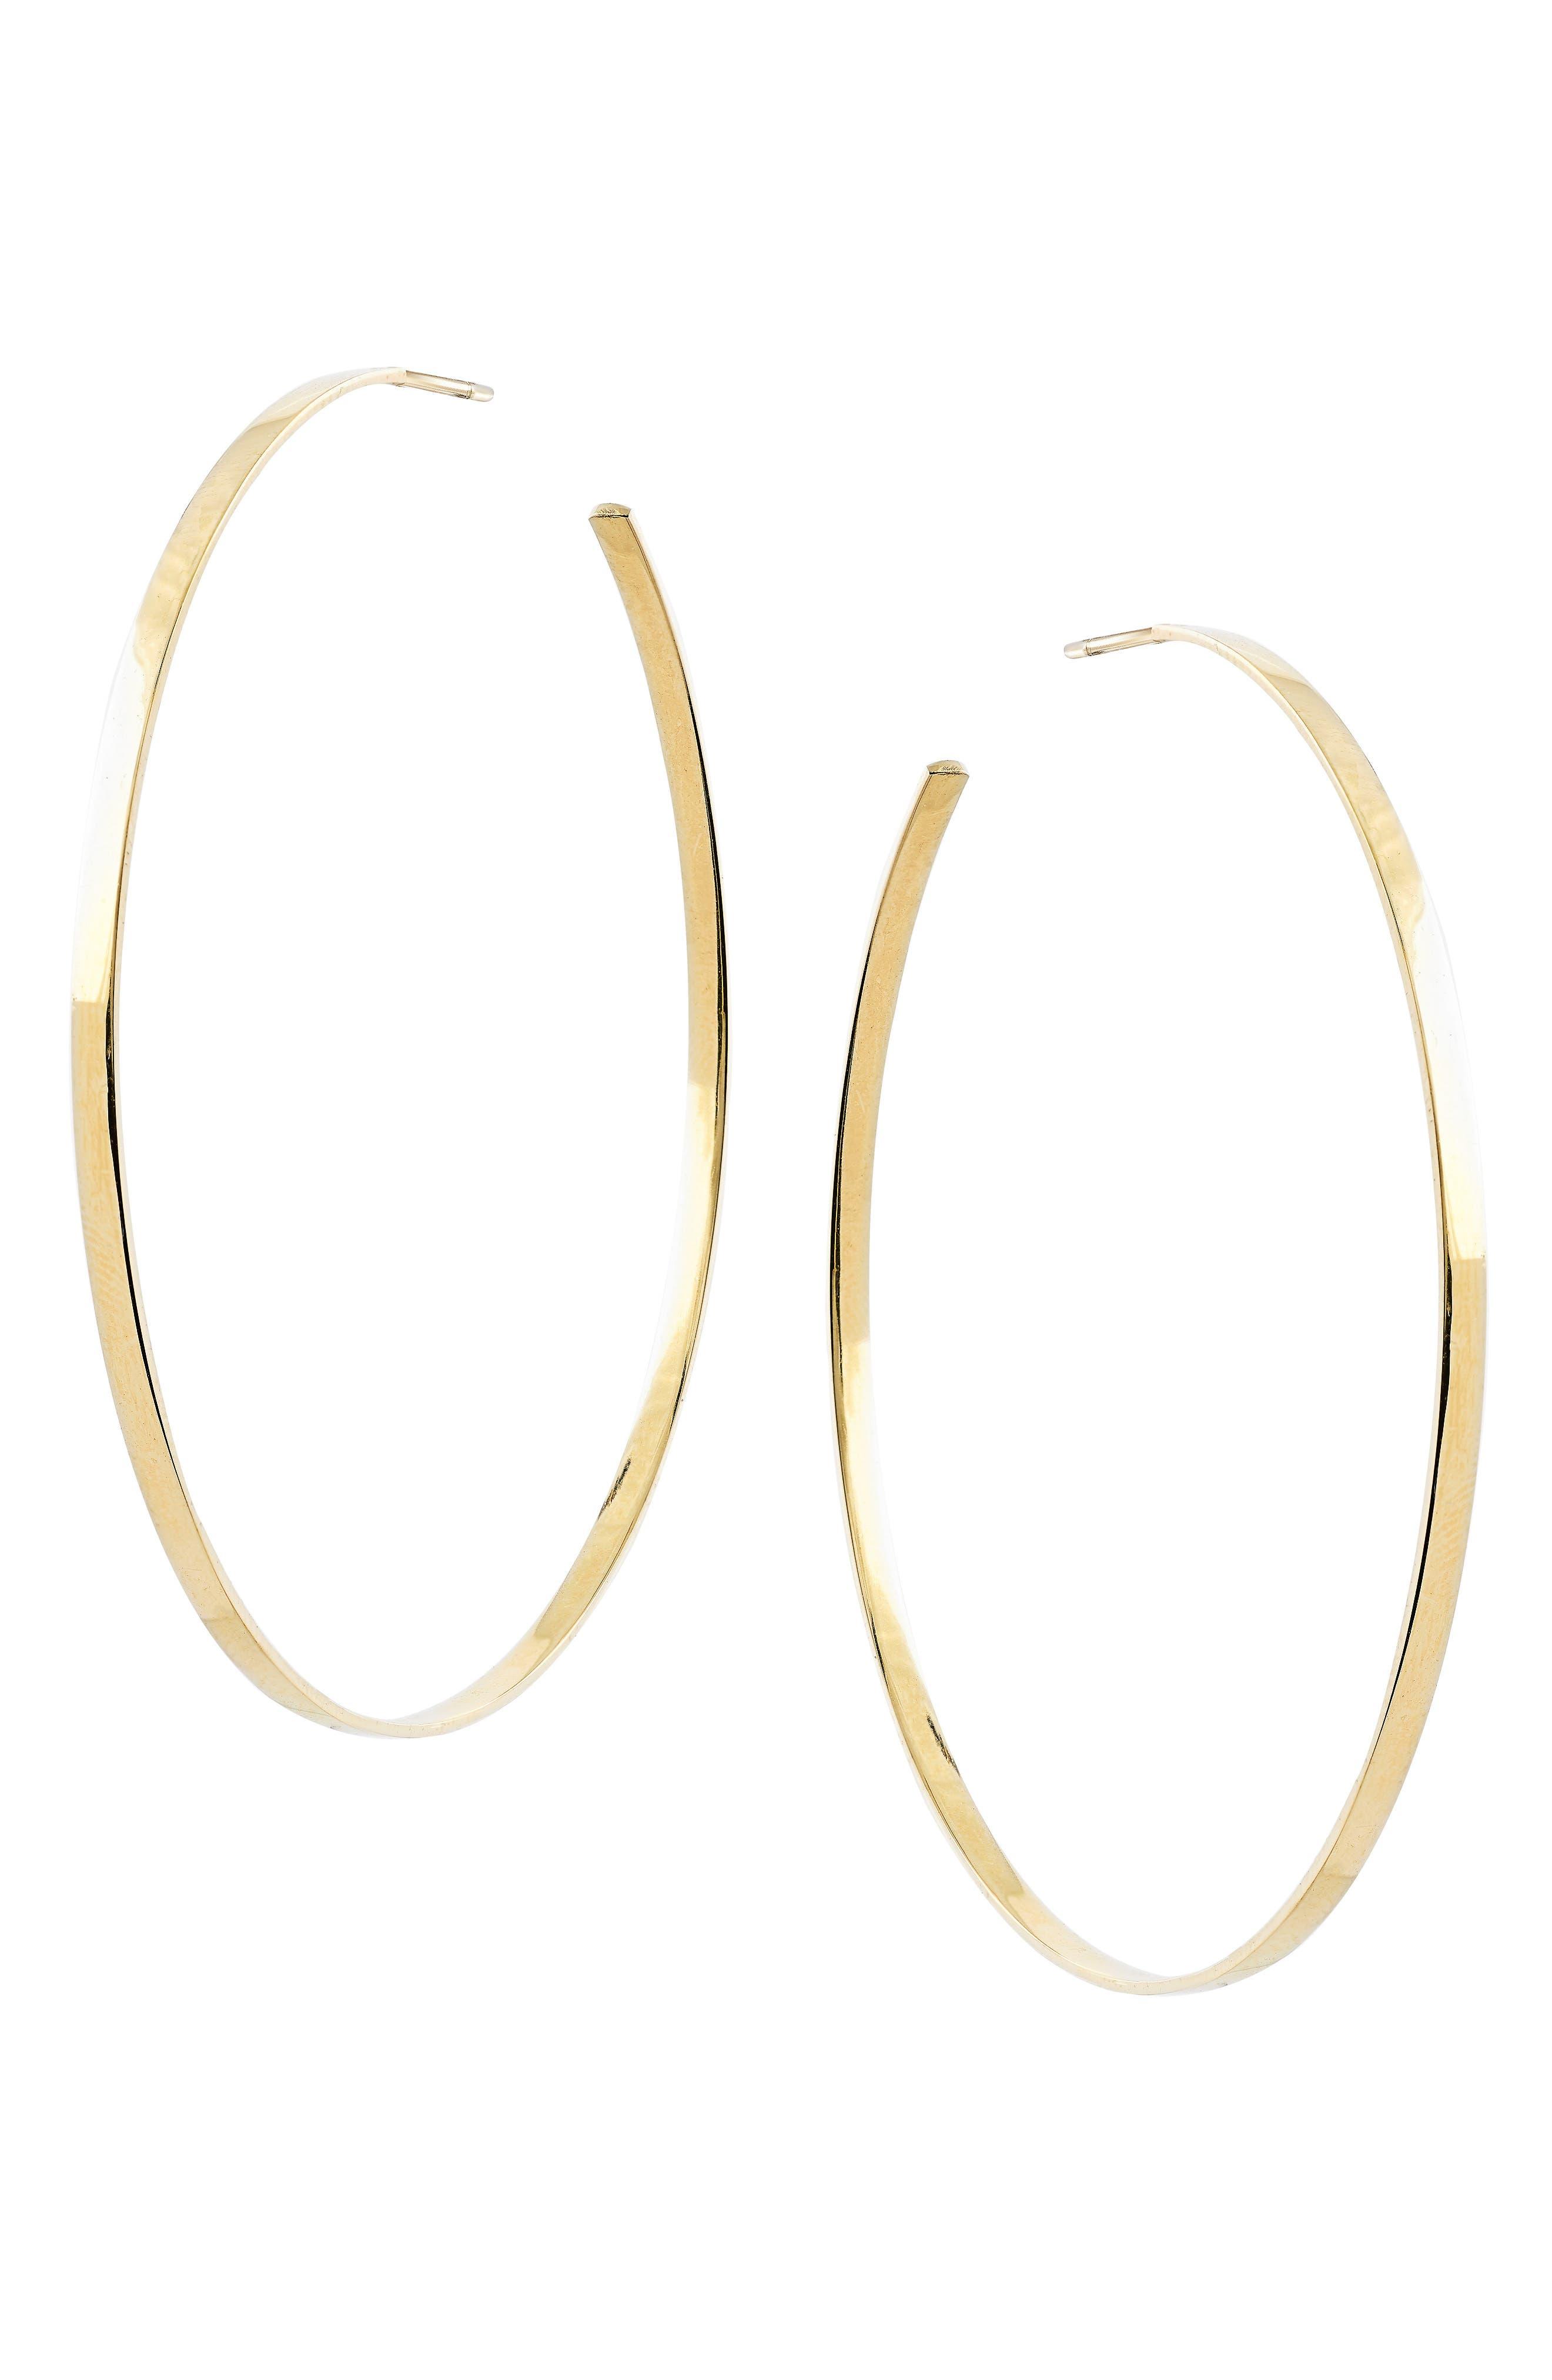 LANA JEWELRY Sunrise Hoop Earrings, Main, color, YELLOW GOLD